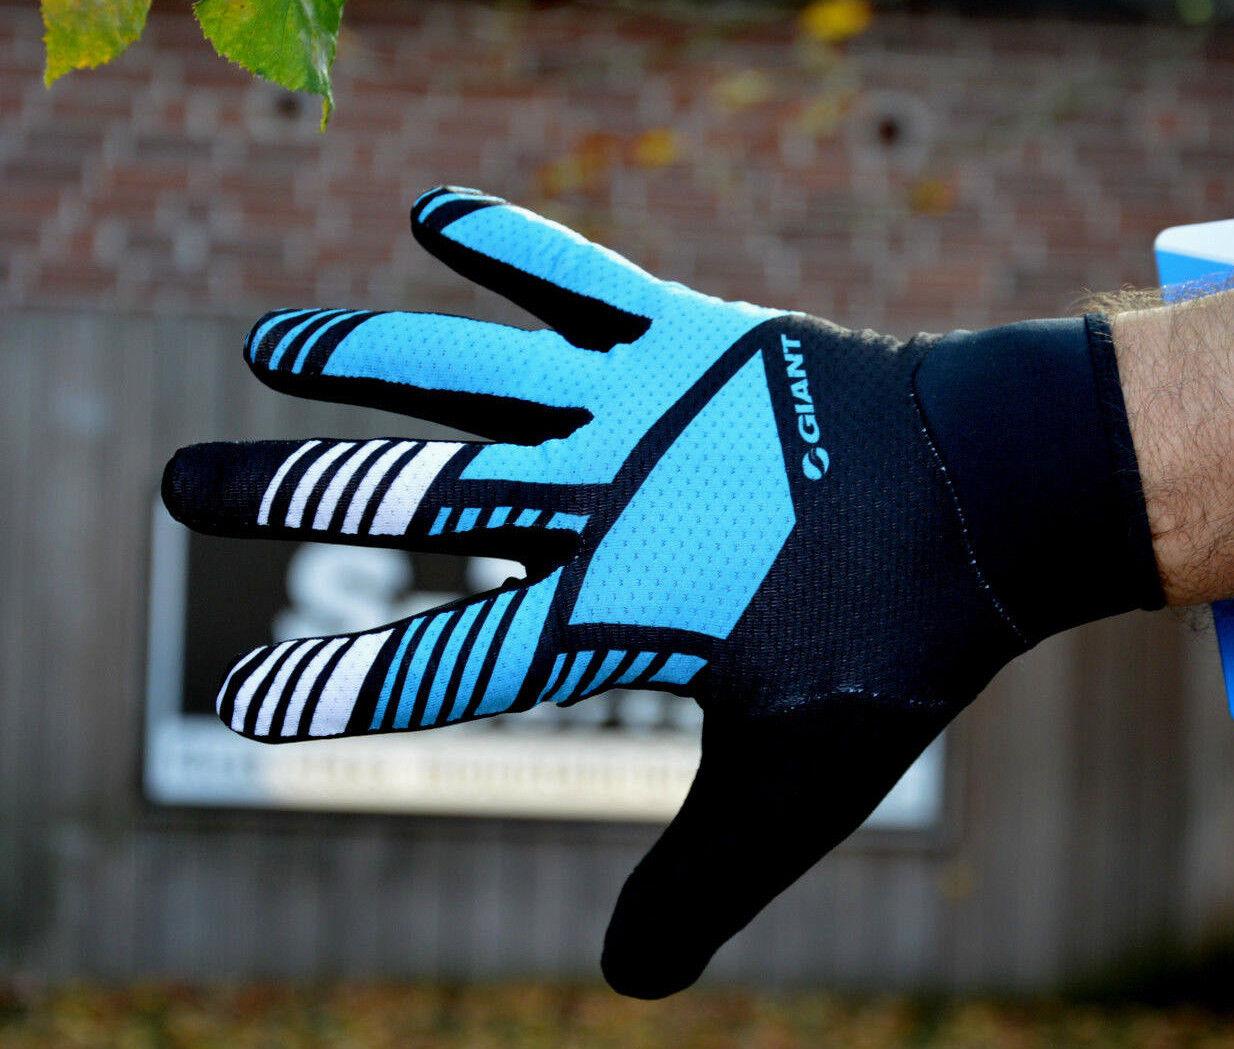 Giant Transfer leichte Langfinger Fahrrad Handschuhe MTB blue black